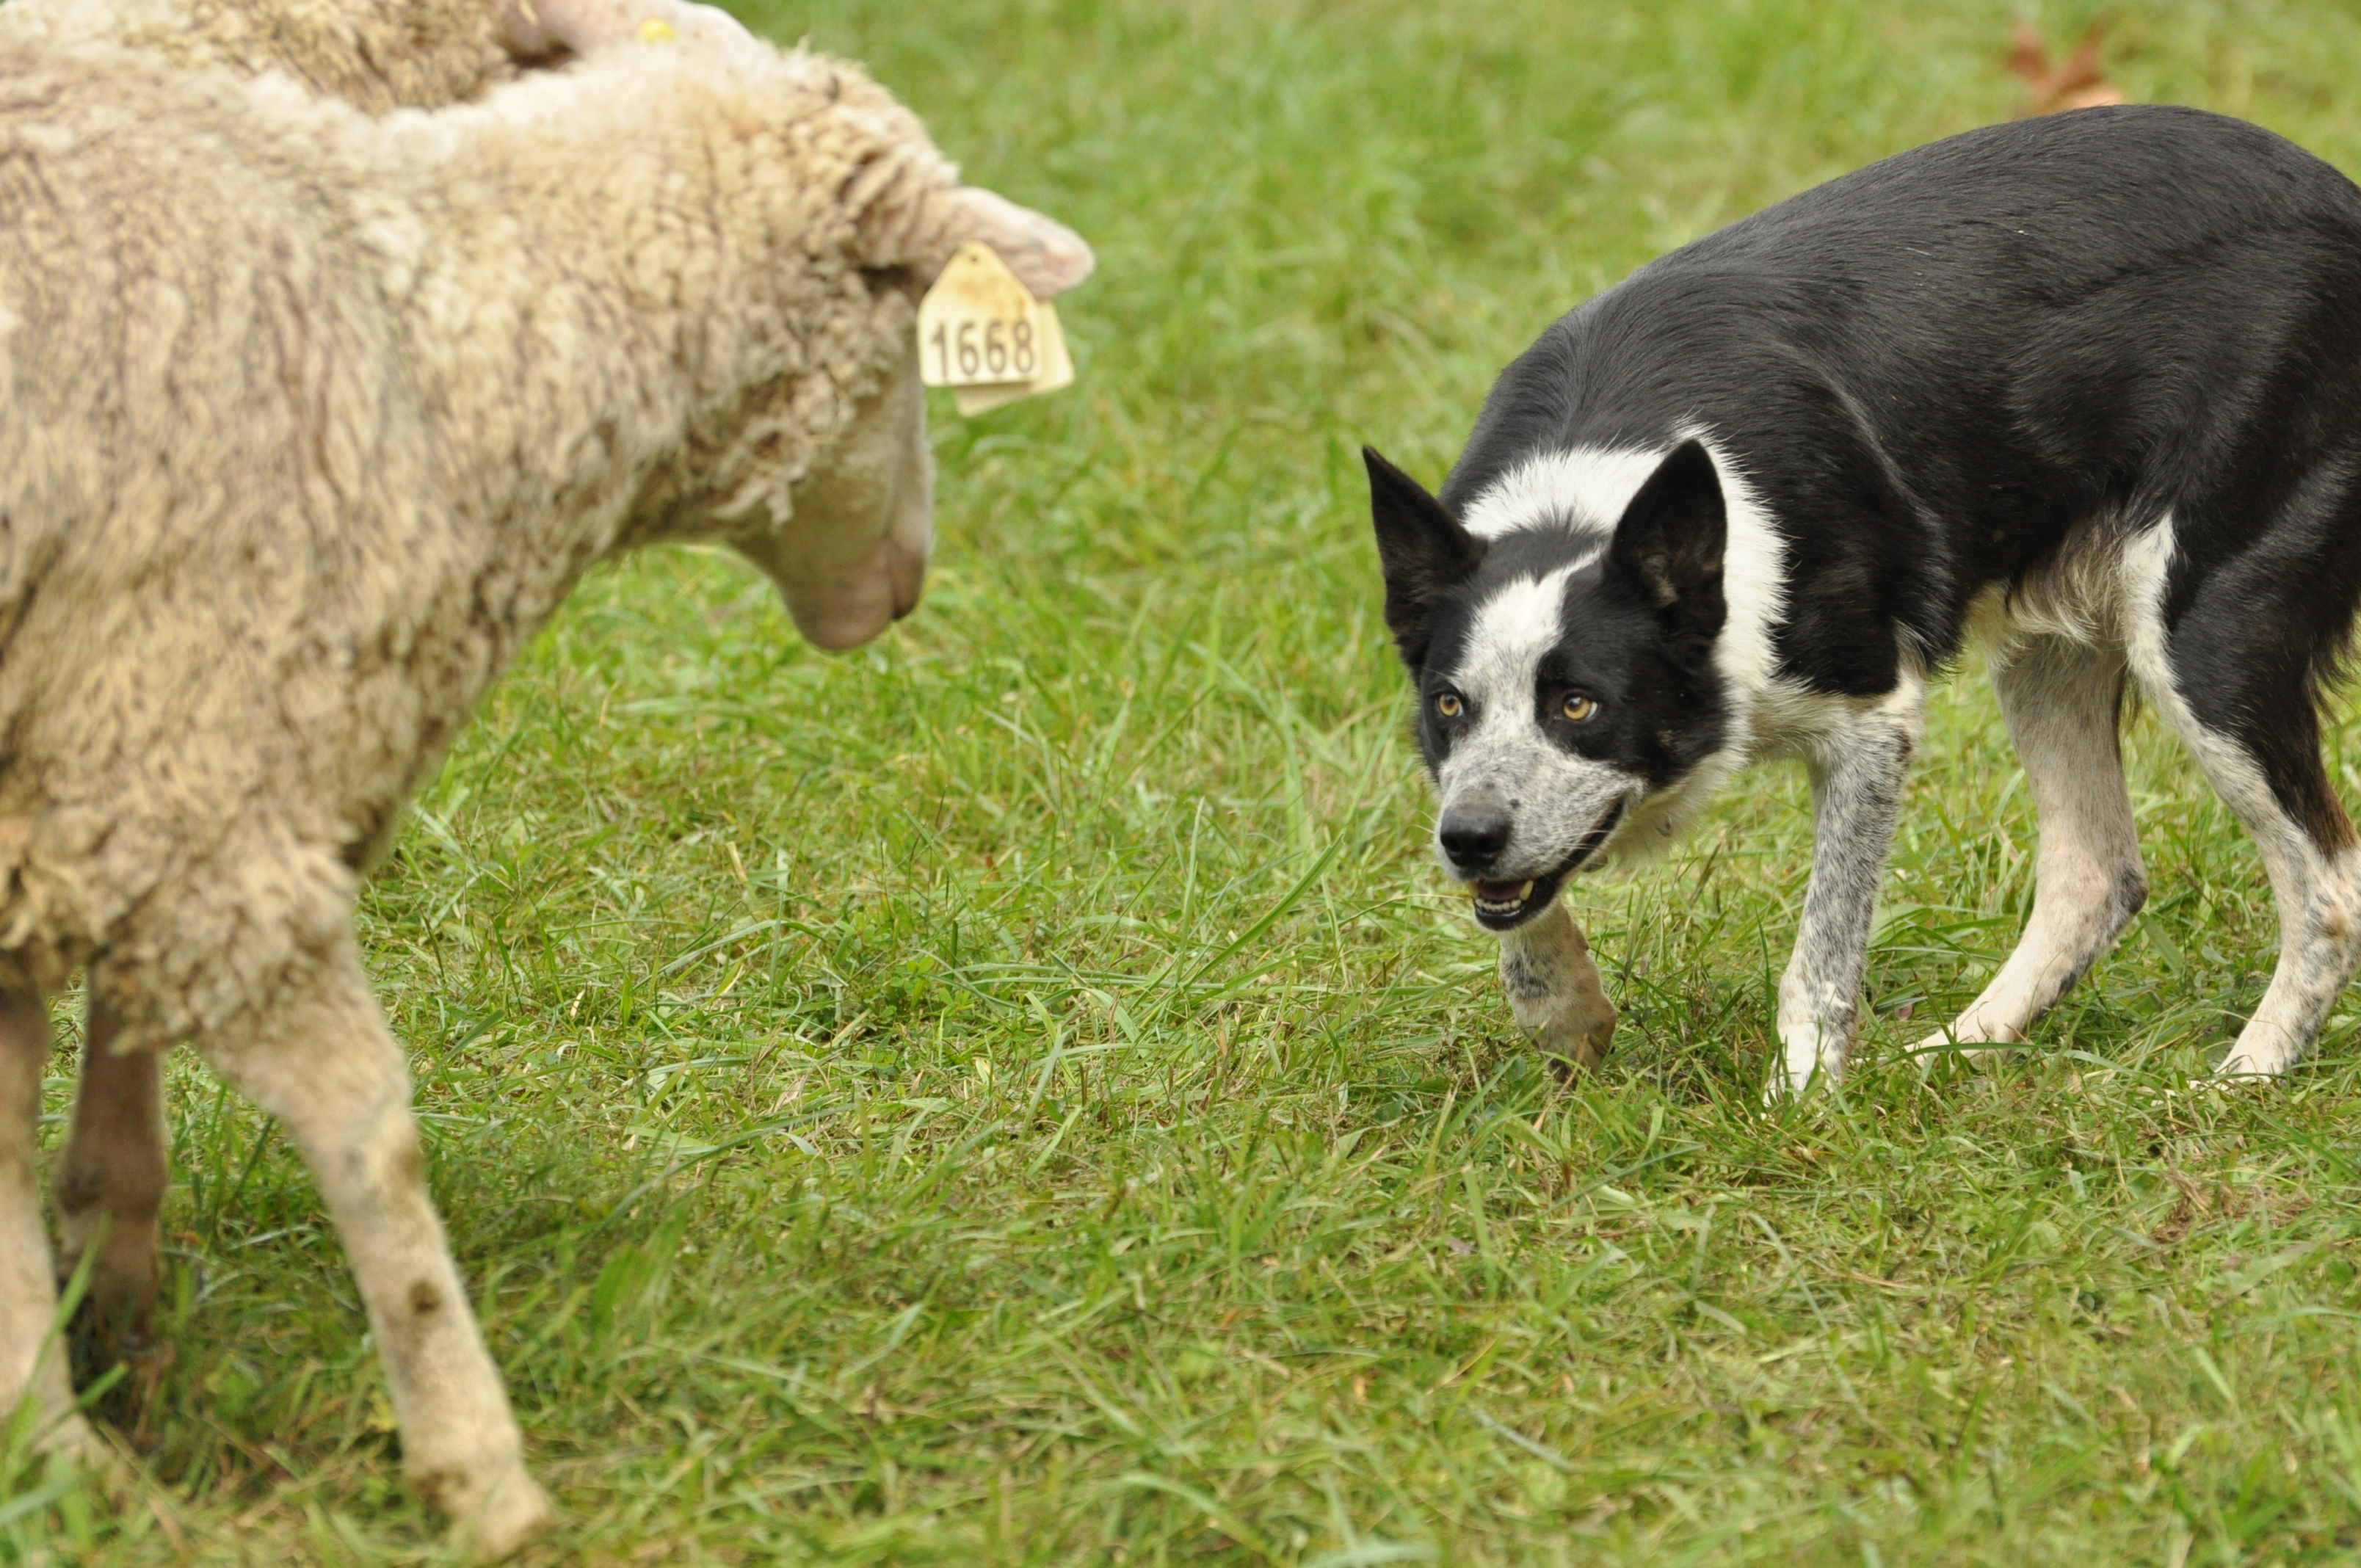 Sheep and dog photo